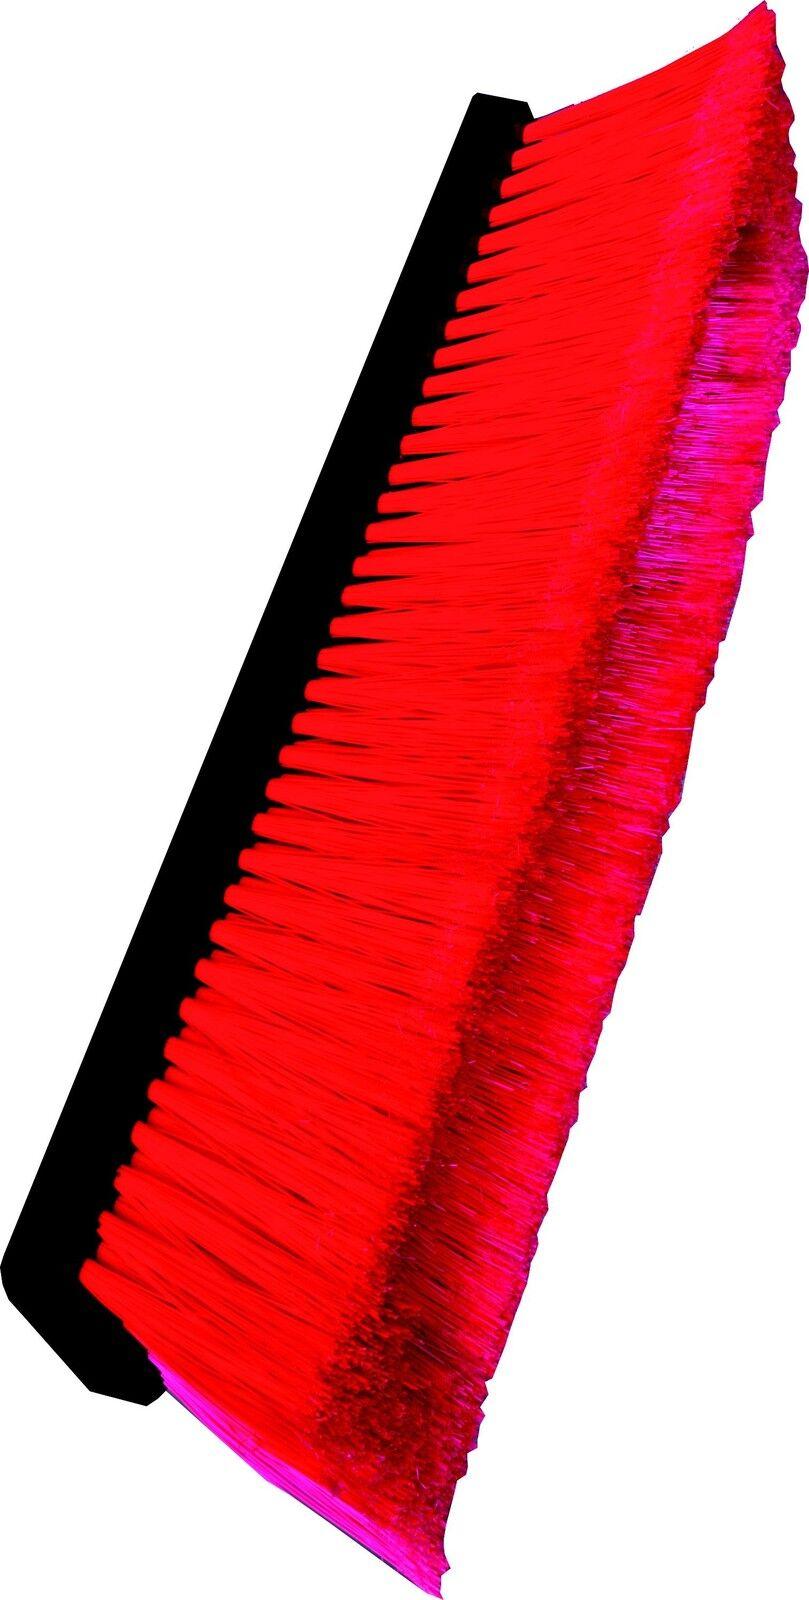 Lewi qleen 71008 solaire Brosse 60 cm Rouge Brosse Lavage Brosse pour nettoyage solaire